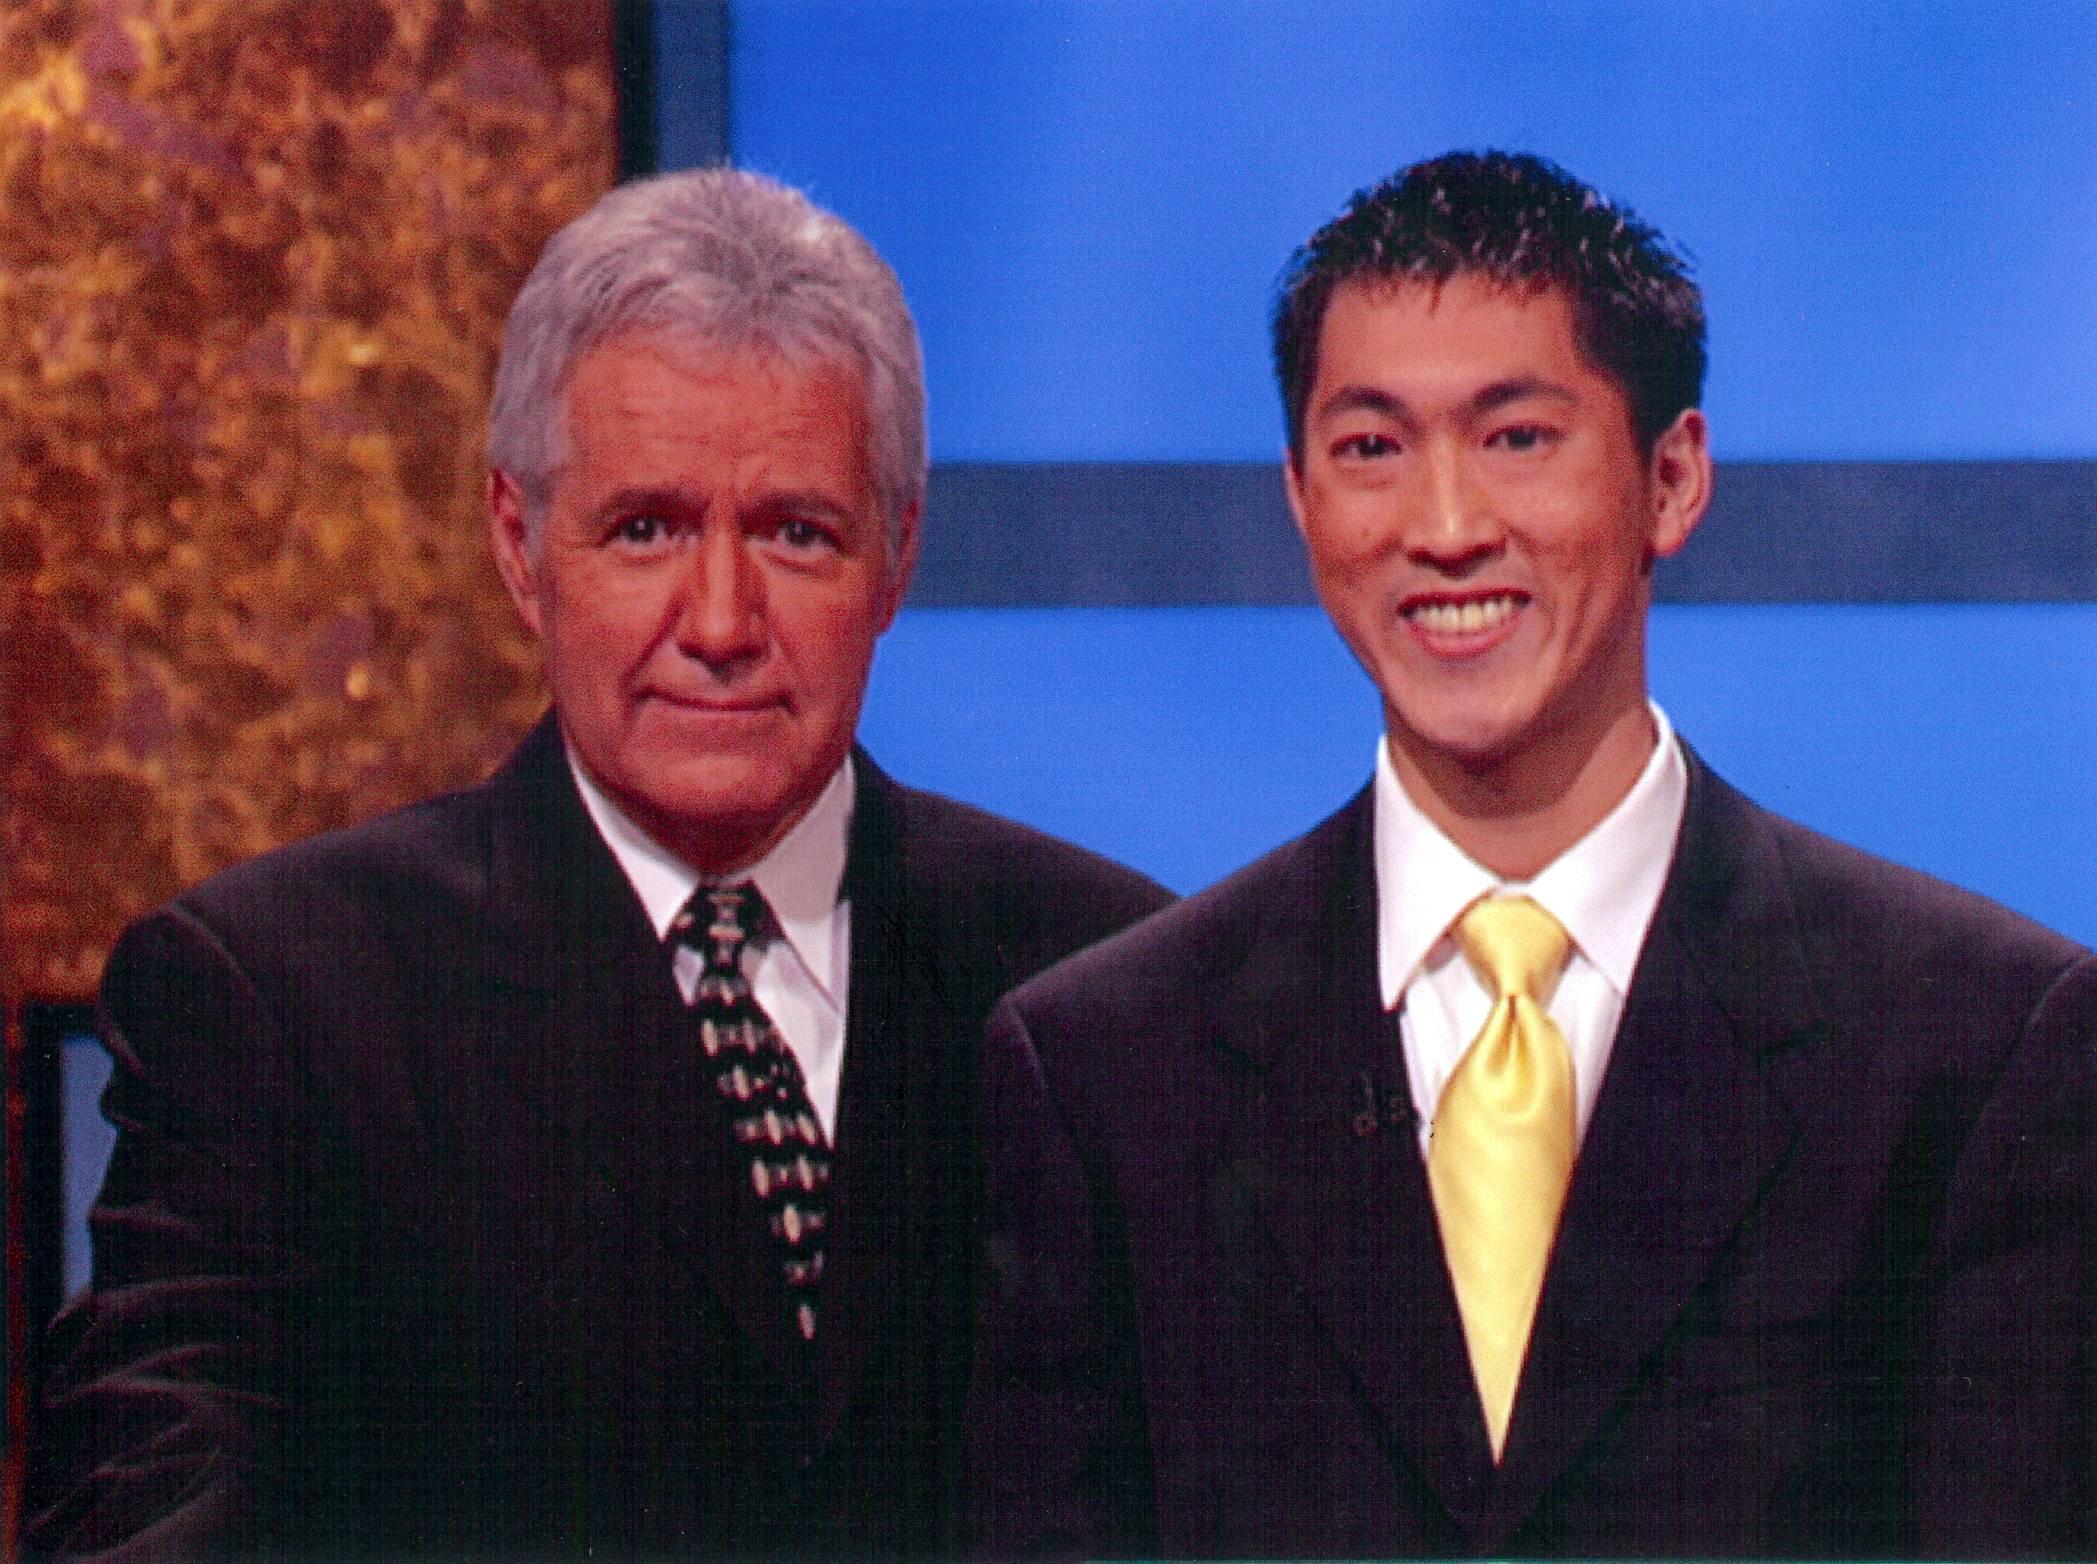 The author with Jeopardy! host Alex Trebek